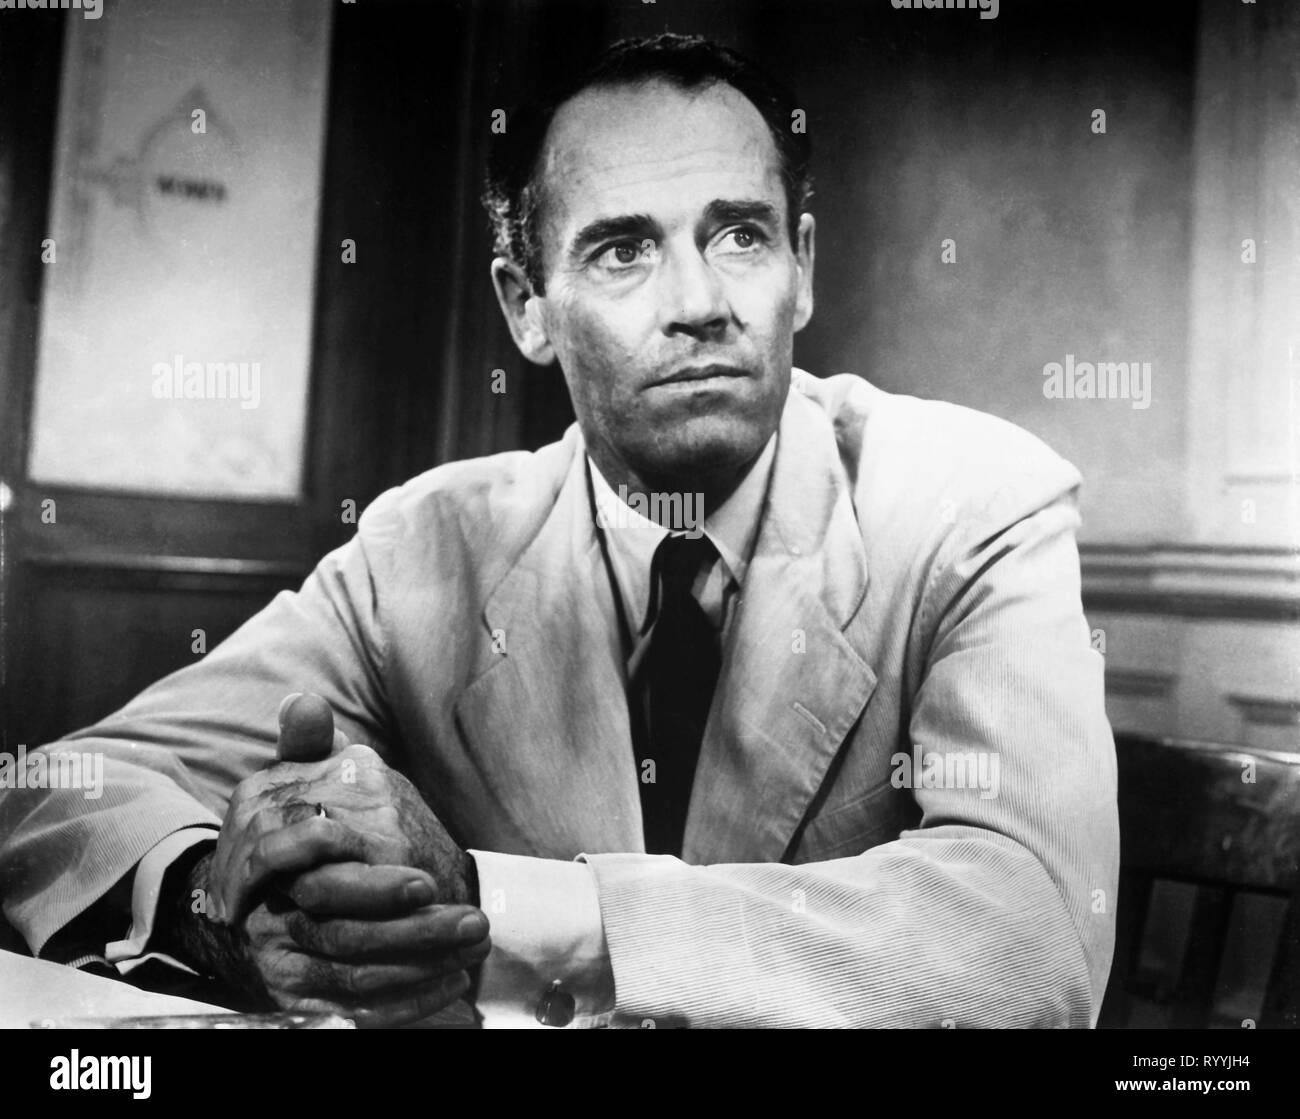 HENRY FONDA, 12 ANGRY MEN, 1957 - Stock Image